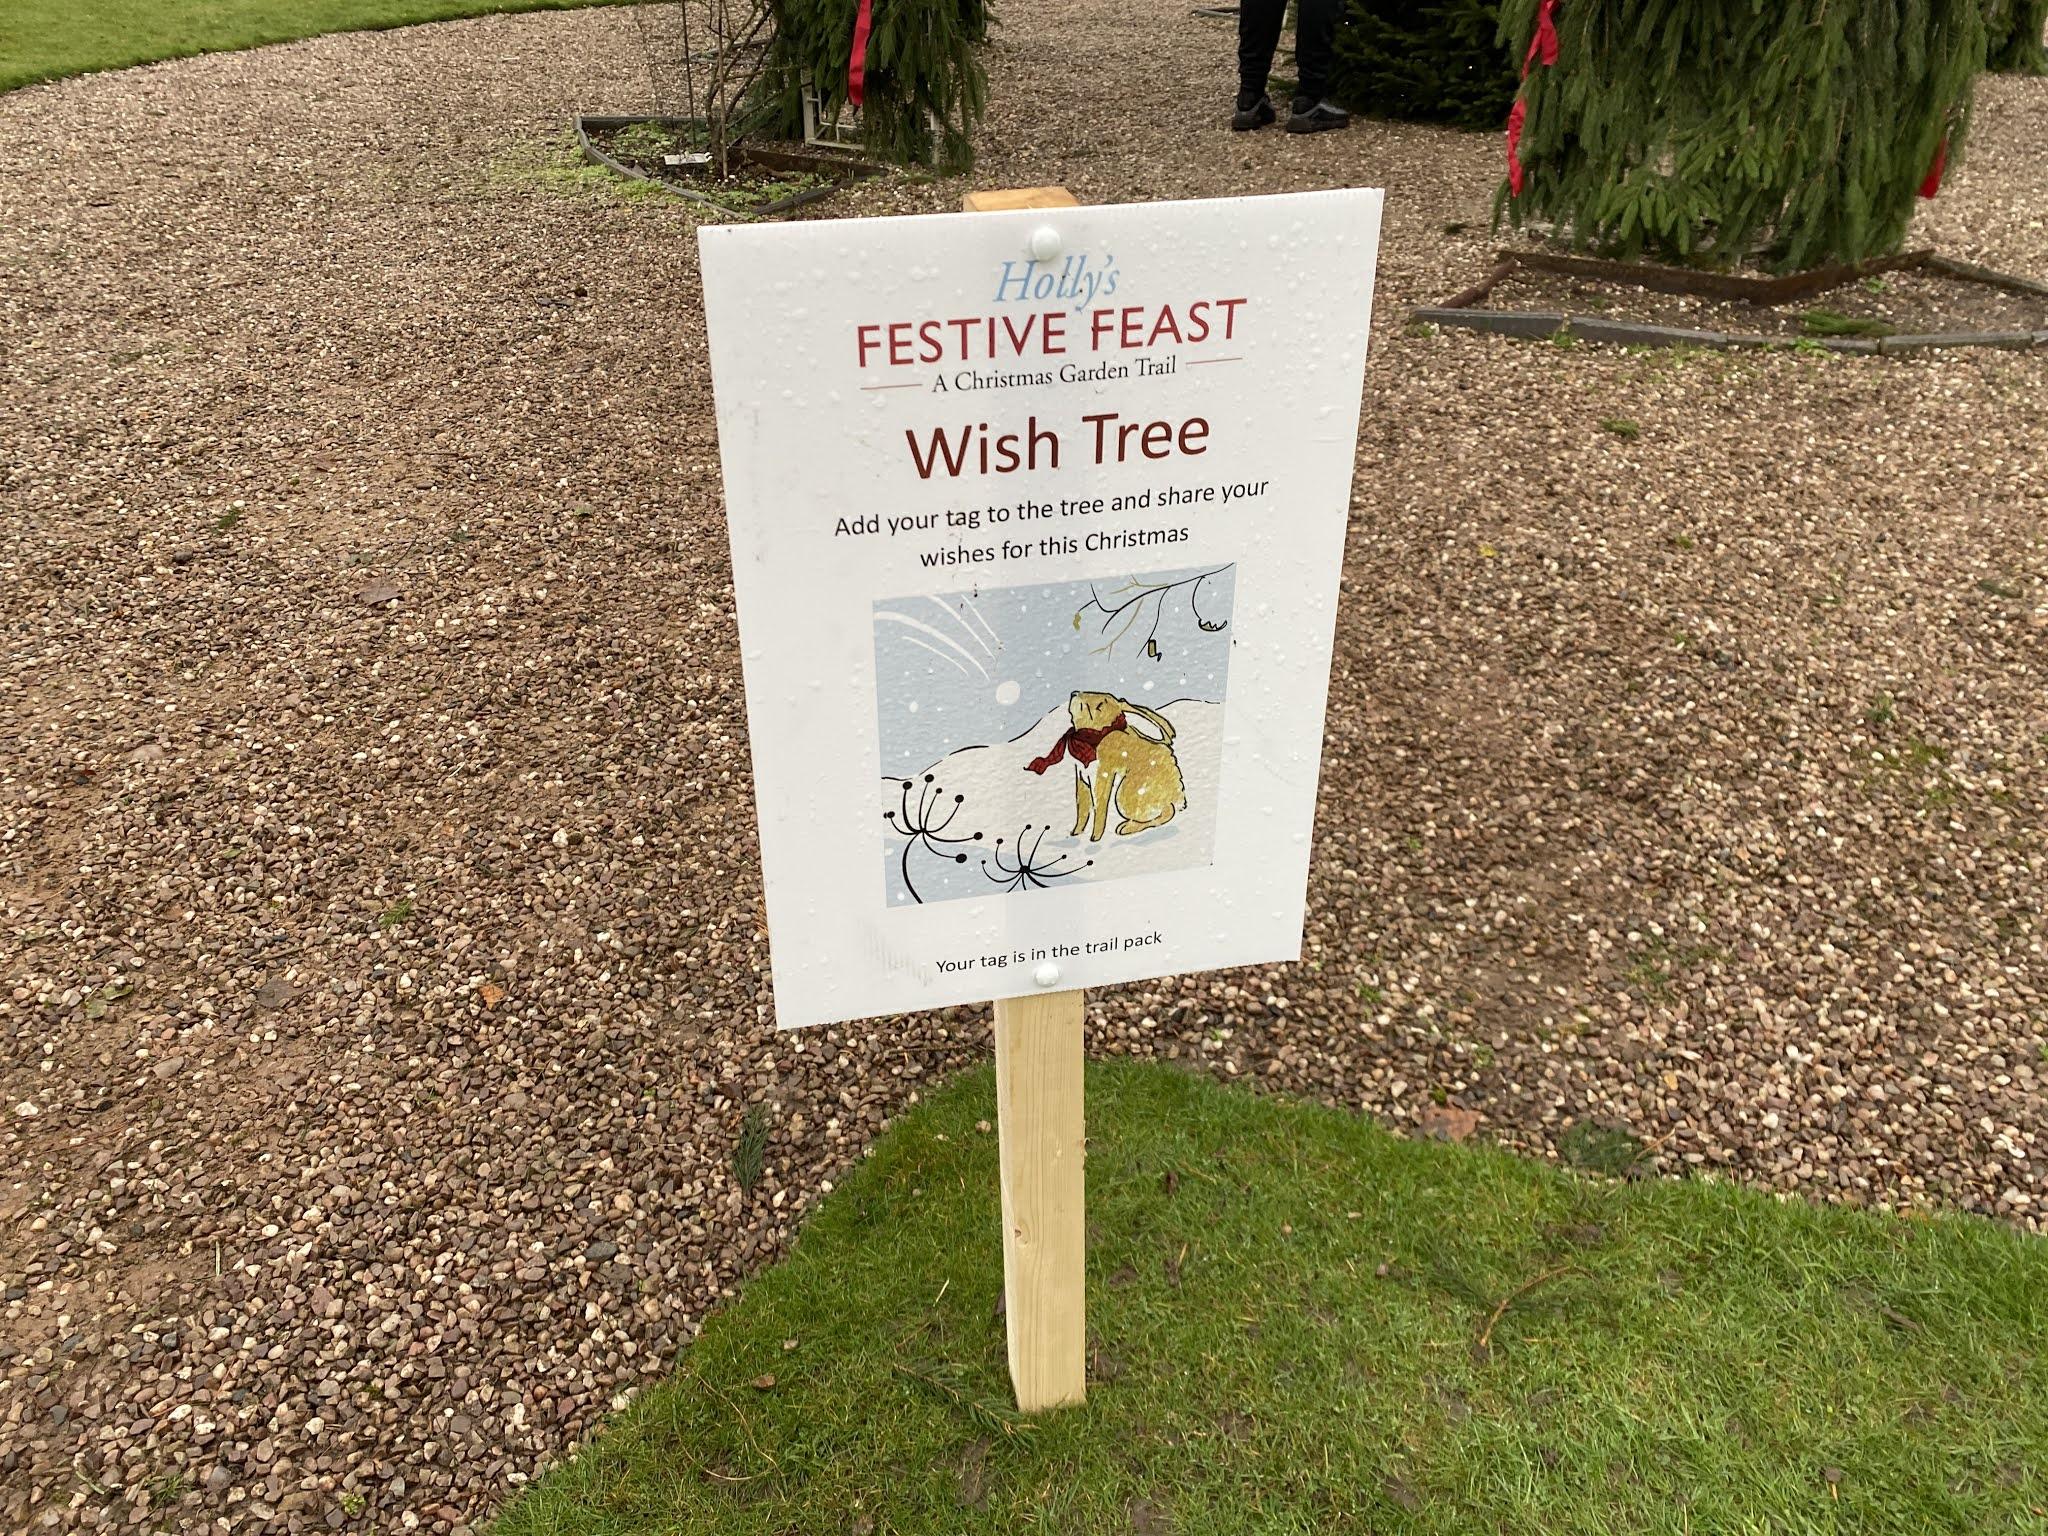 Holly's Festive Feast wish tree